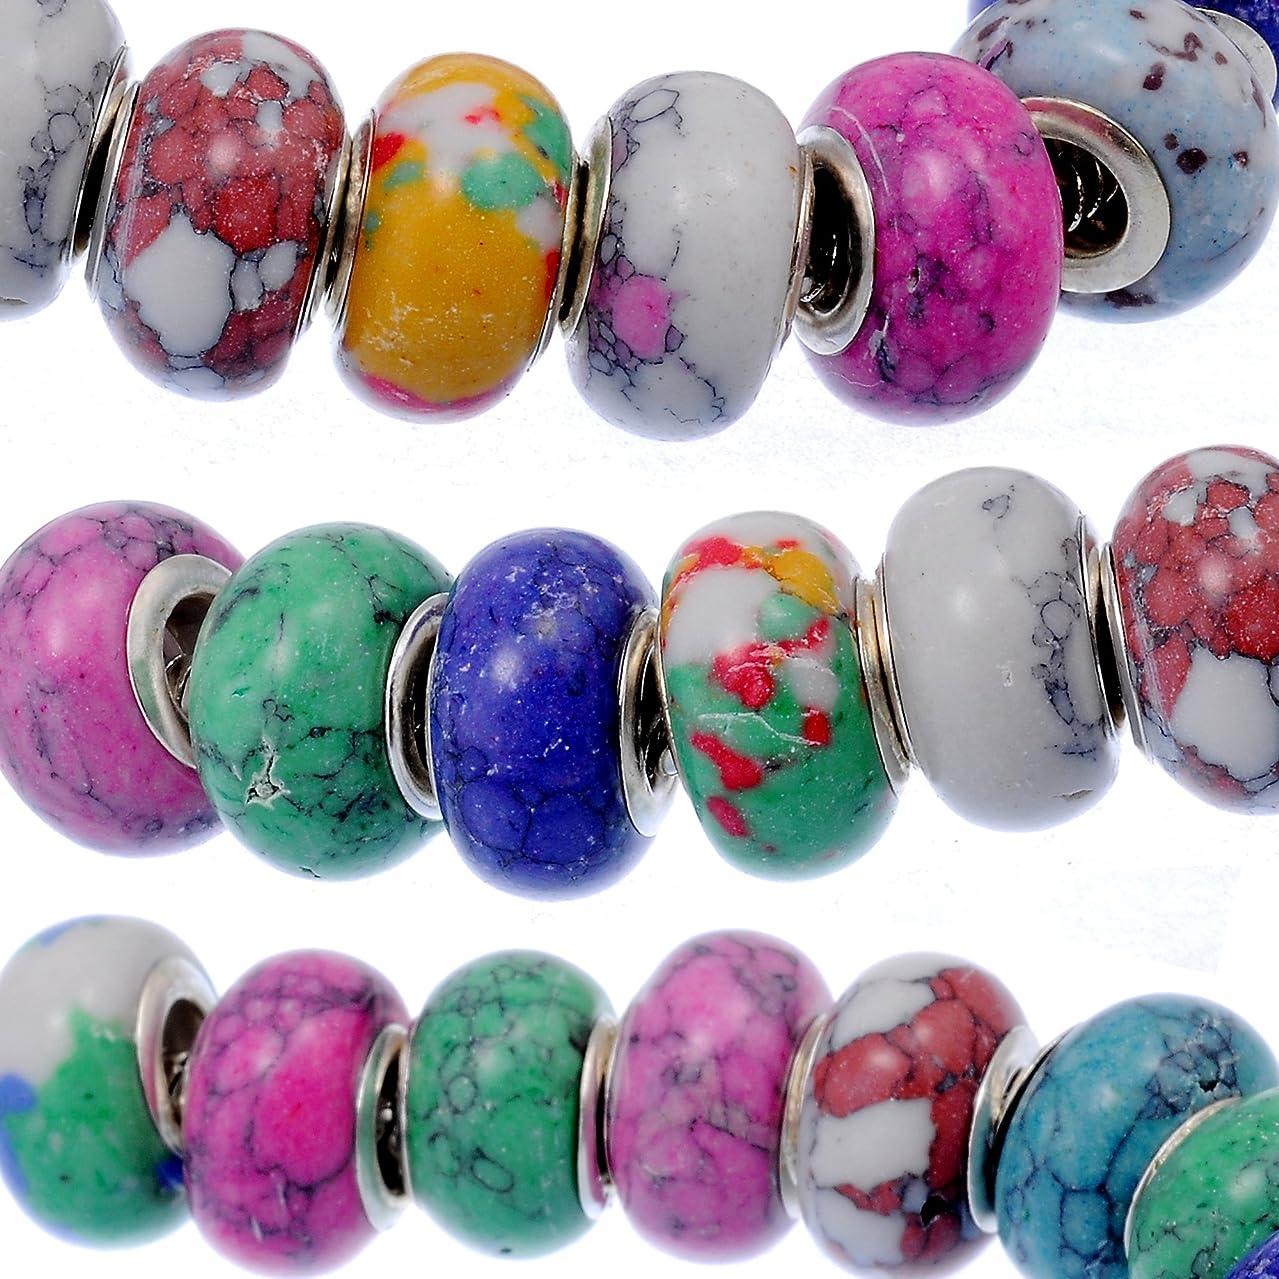 RUBYCA 50Pcs Mix Stone Charm Beads fit European Charm Bracelet for Jewelry Making 14MM